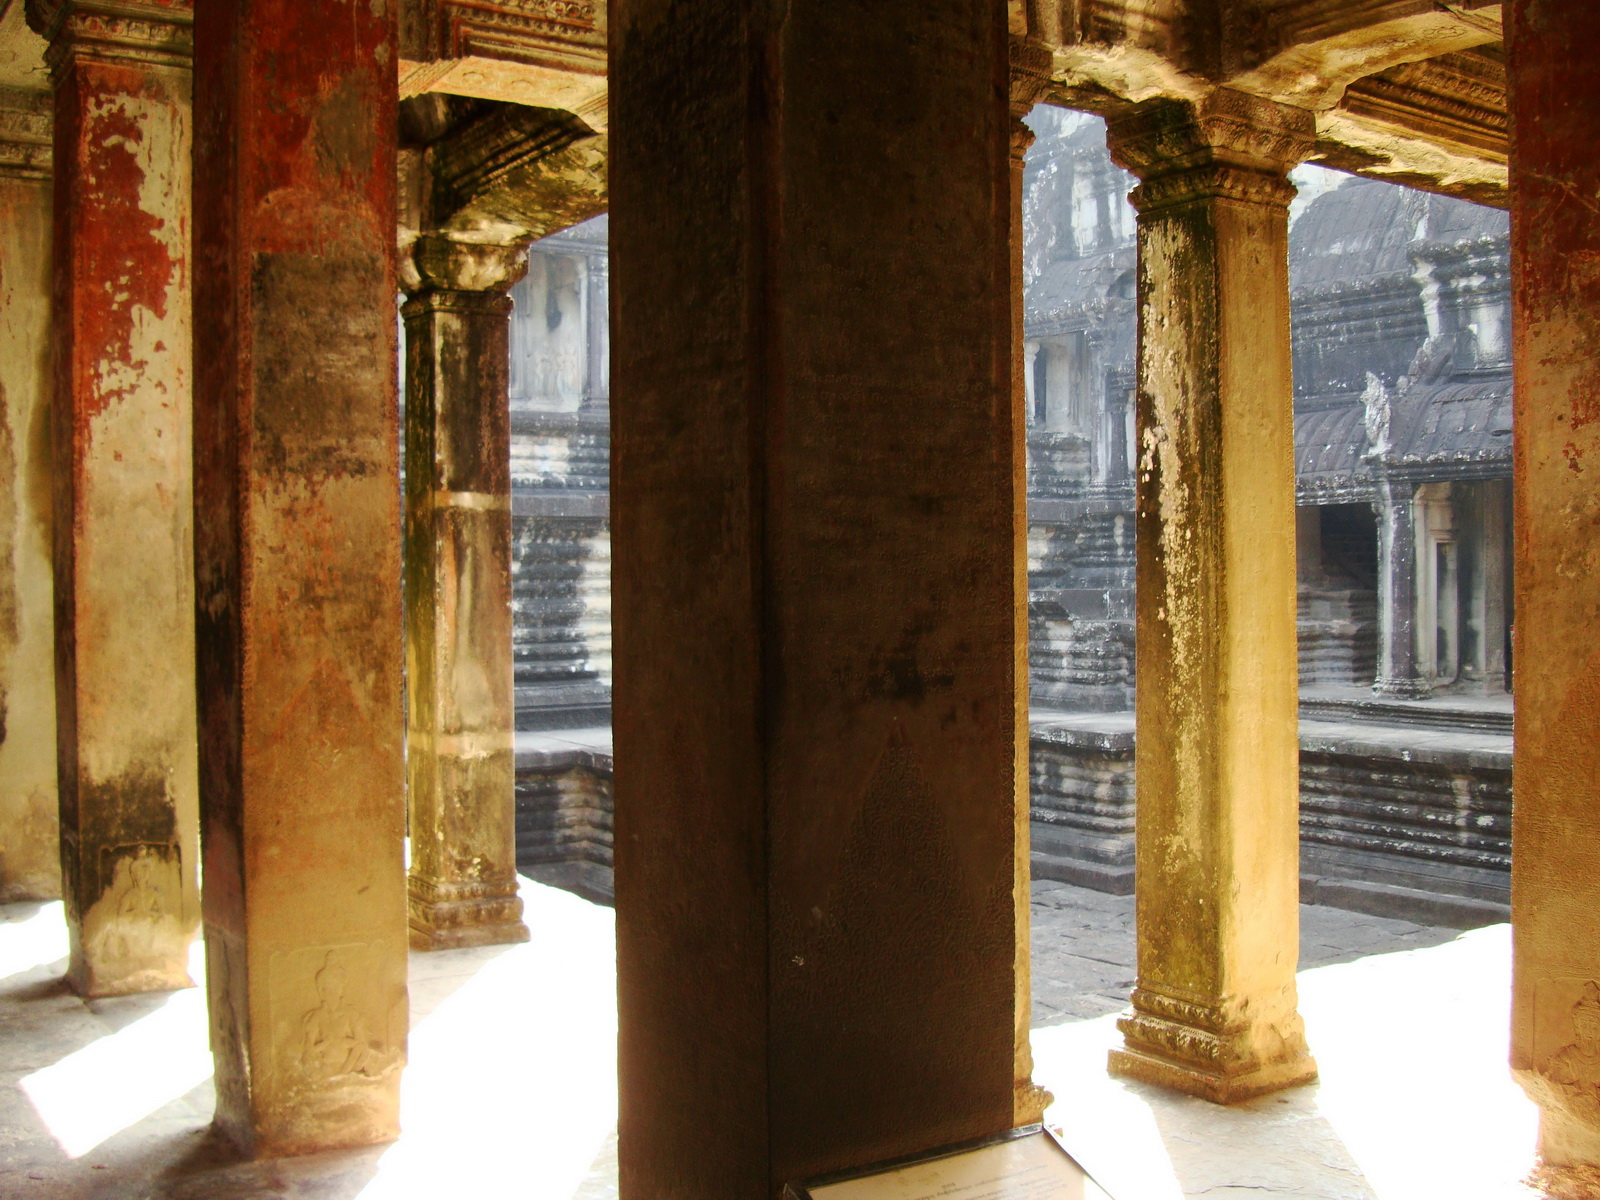 Angkor Wat inner sanctuary gallery columns and passageways 09